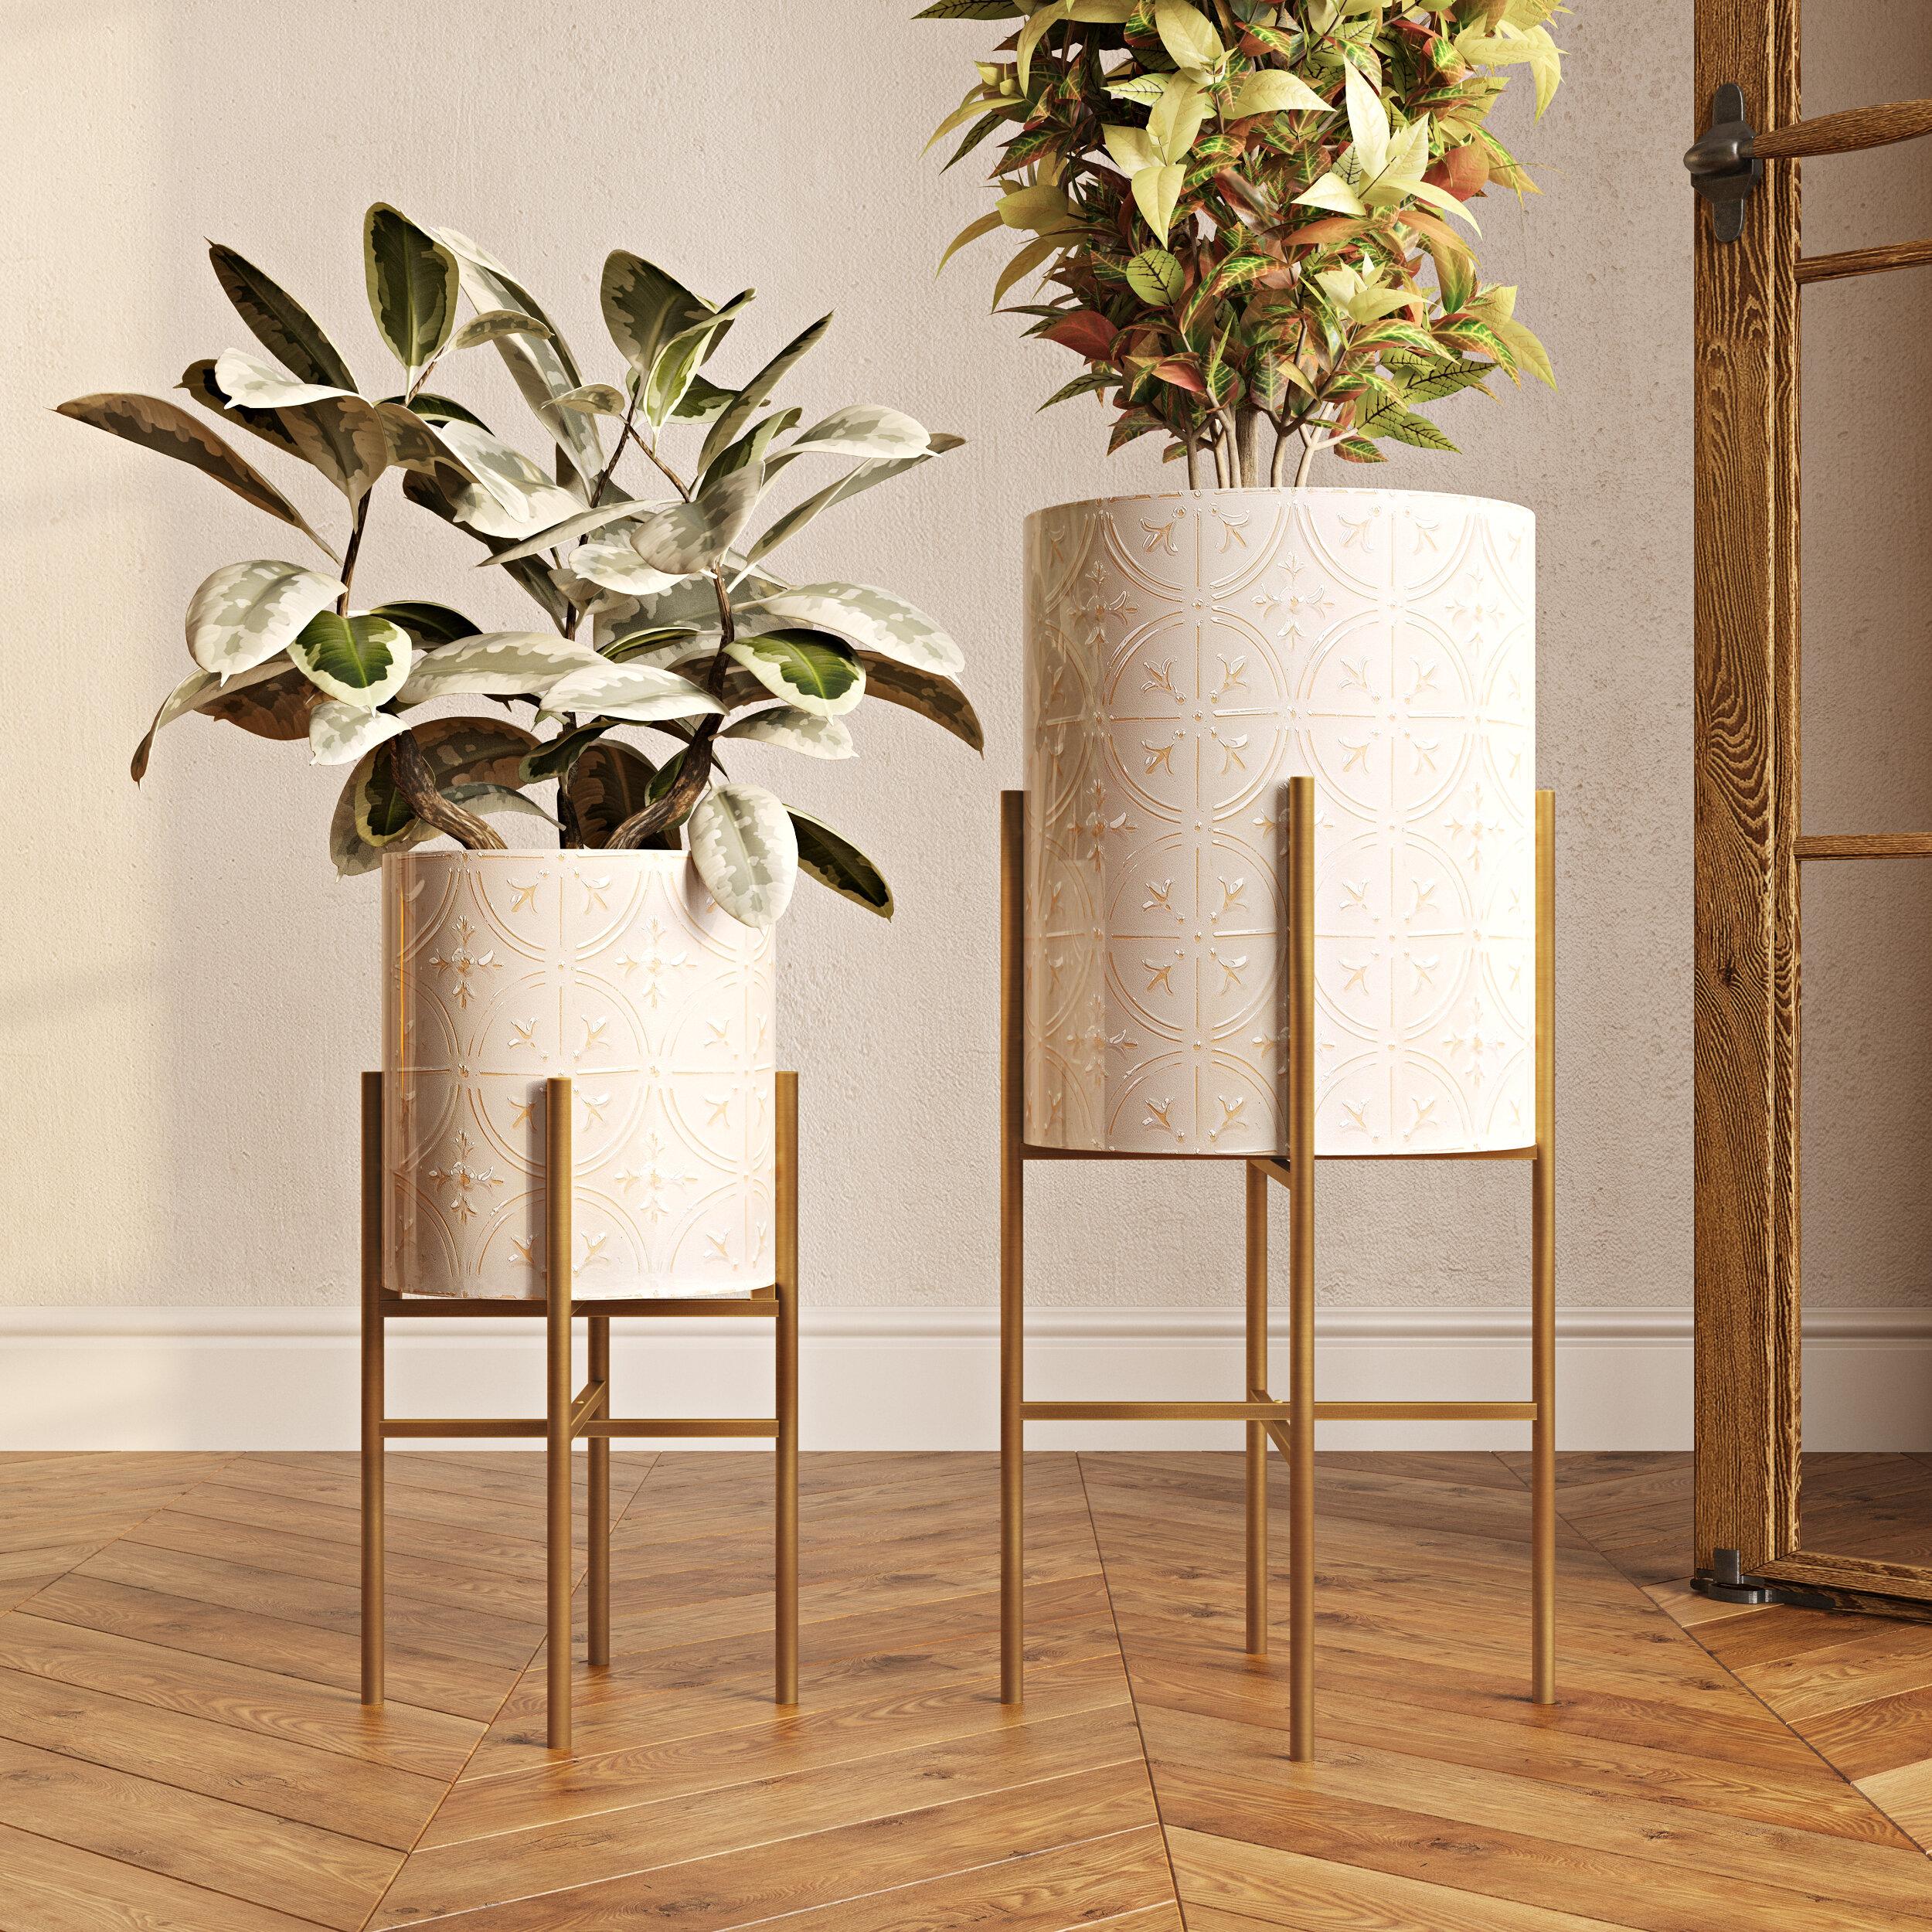 Gold Metal Planter Pots You Ll Love In 2021 Wayfair